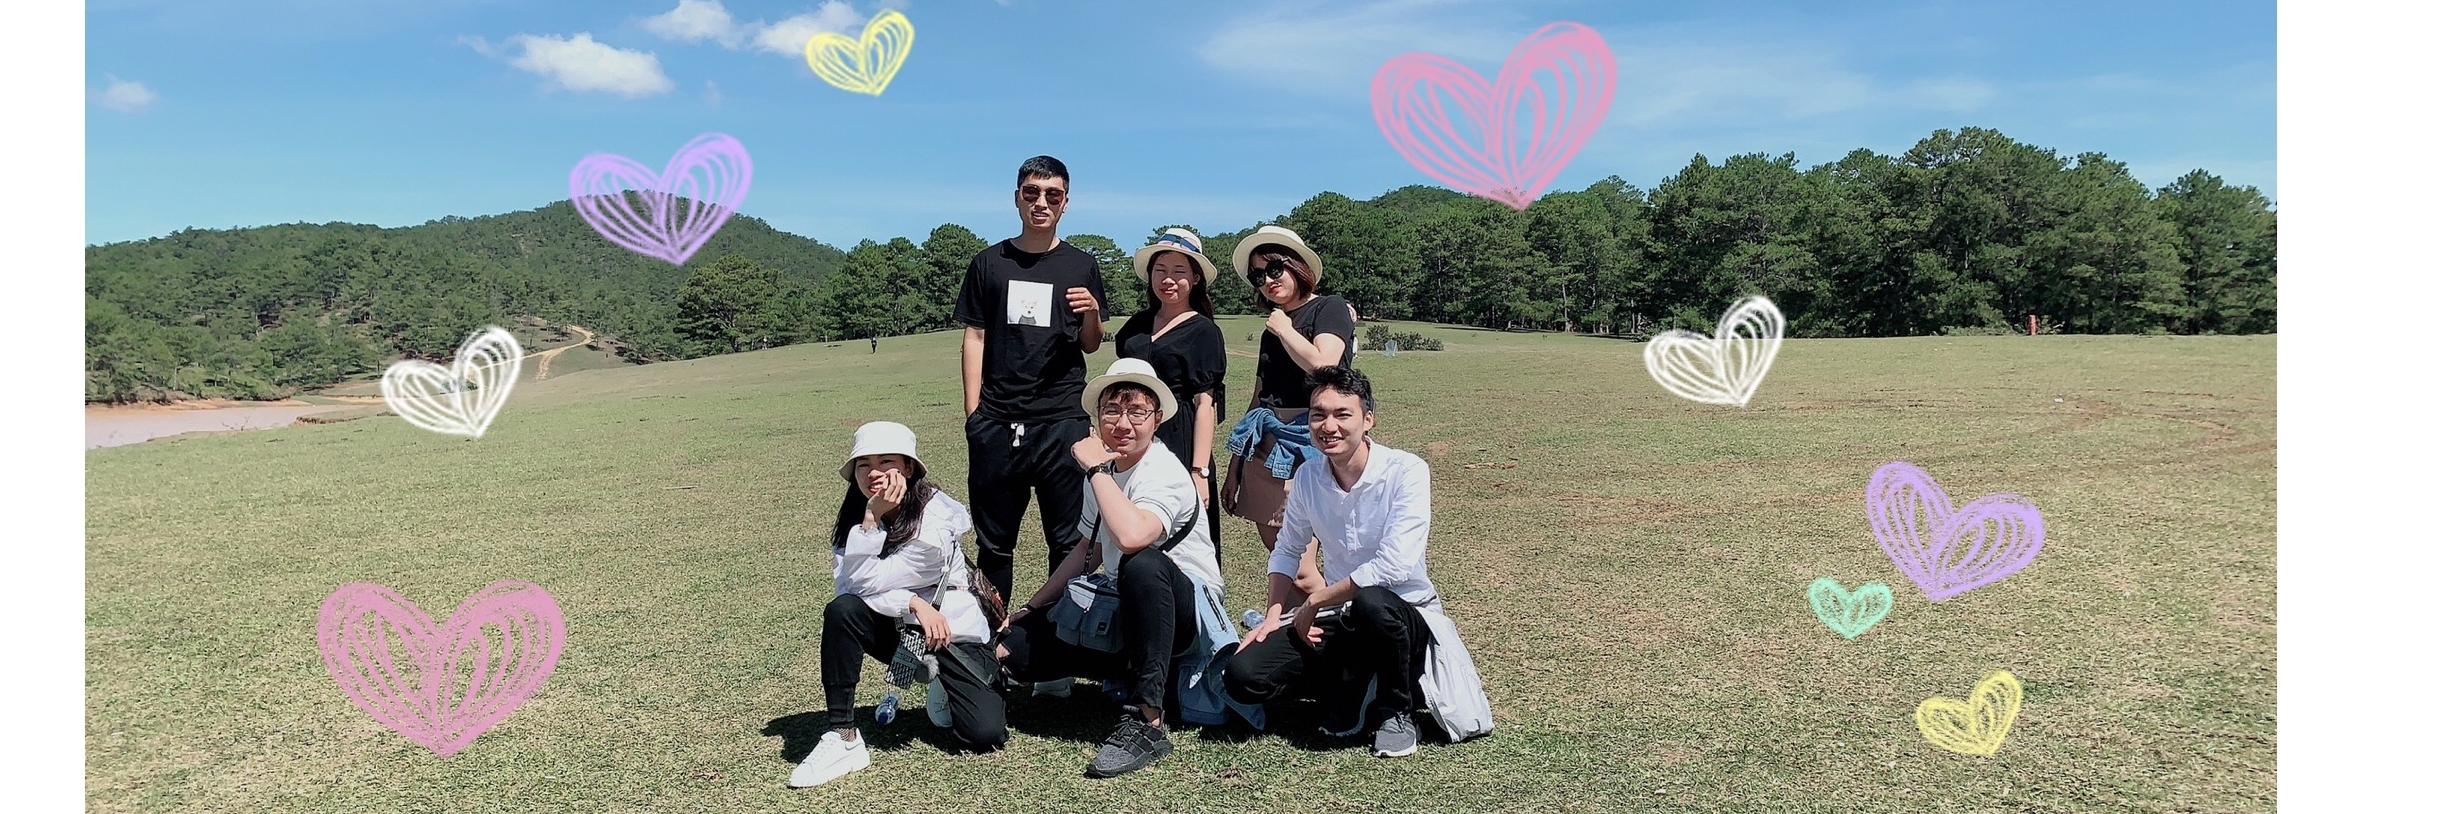 https://gody.vn/blog/leomet784439/post/chuyen-di-thanh-xuan-review-da-lat-5n4d-thanh-xuan-gap-go-4913